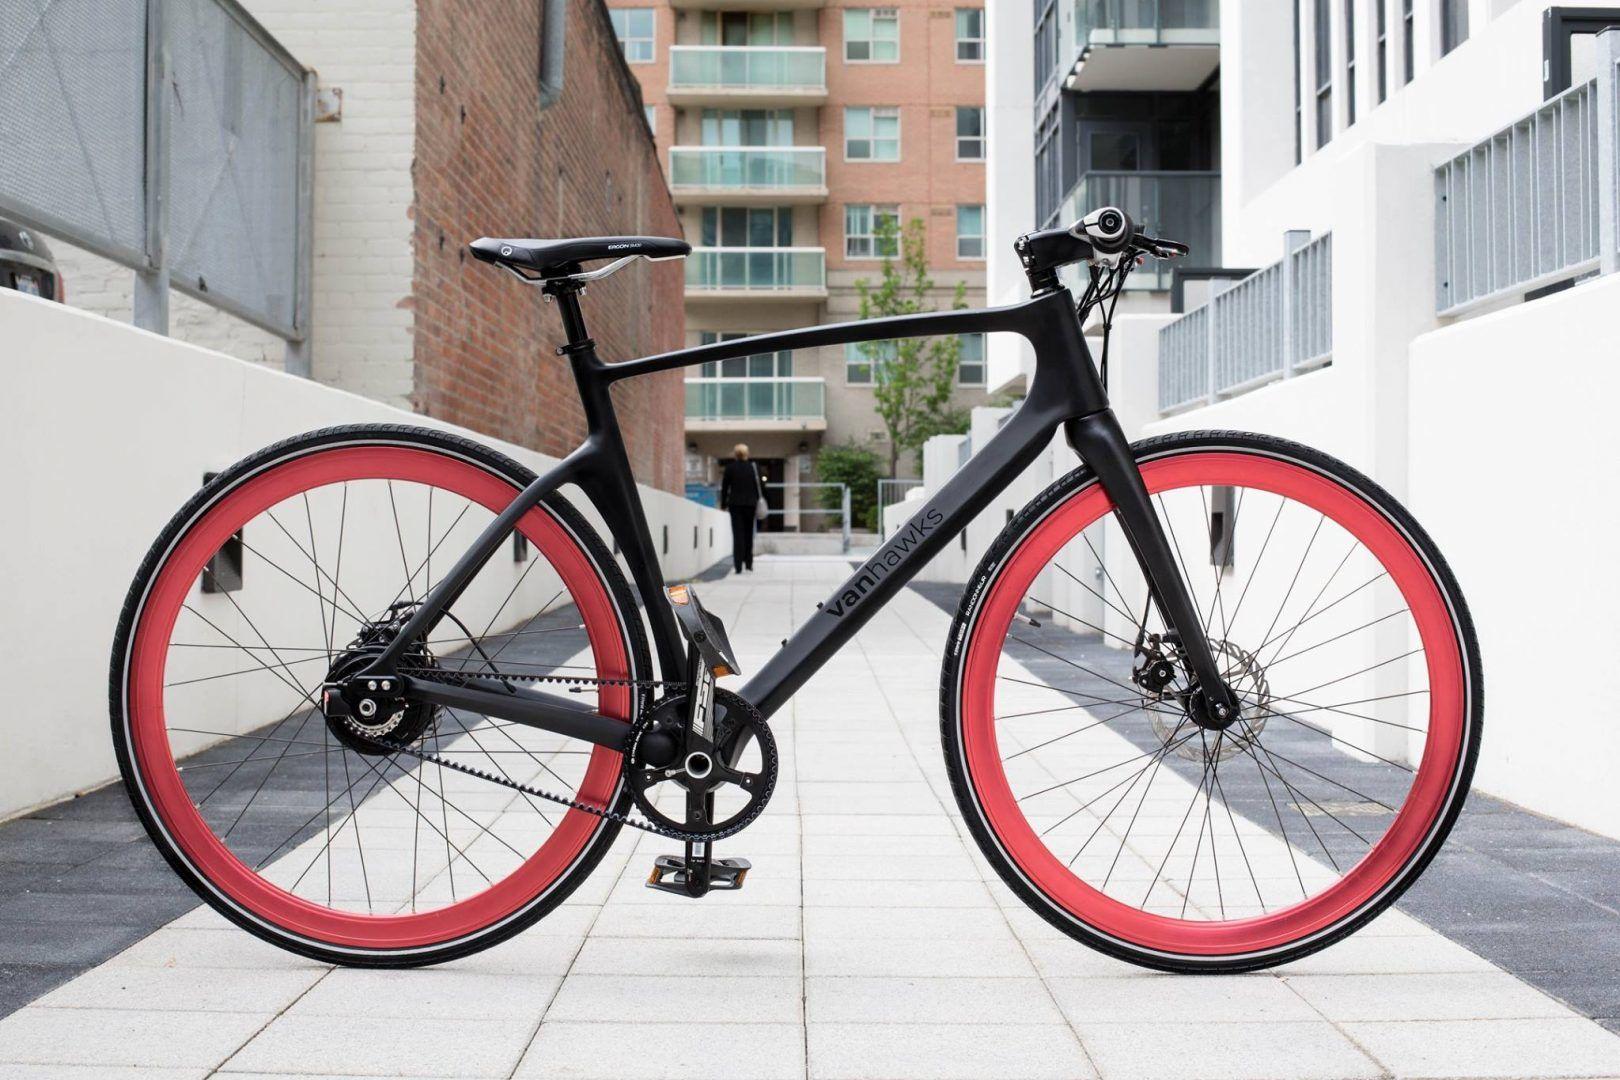 Vanhawks Valour - Okos kerékpár